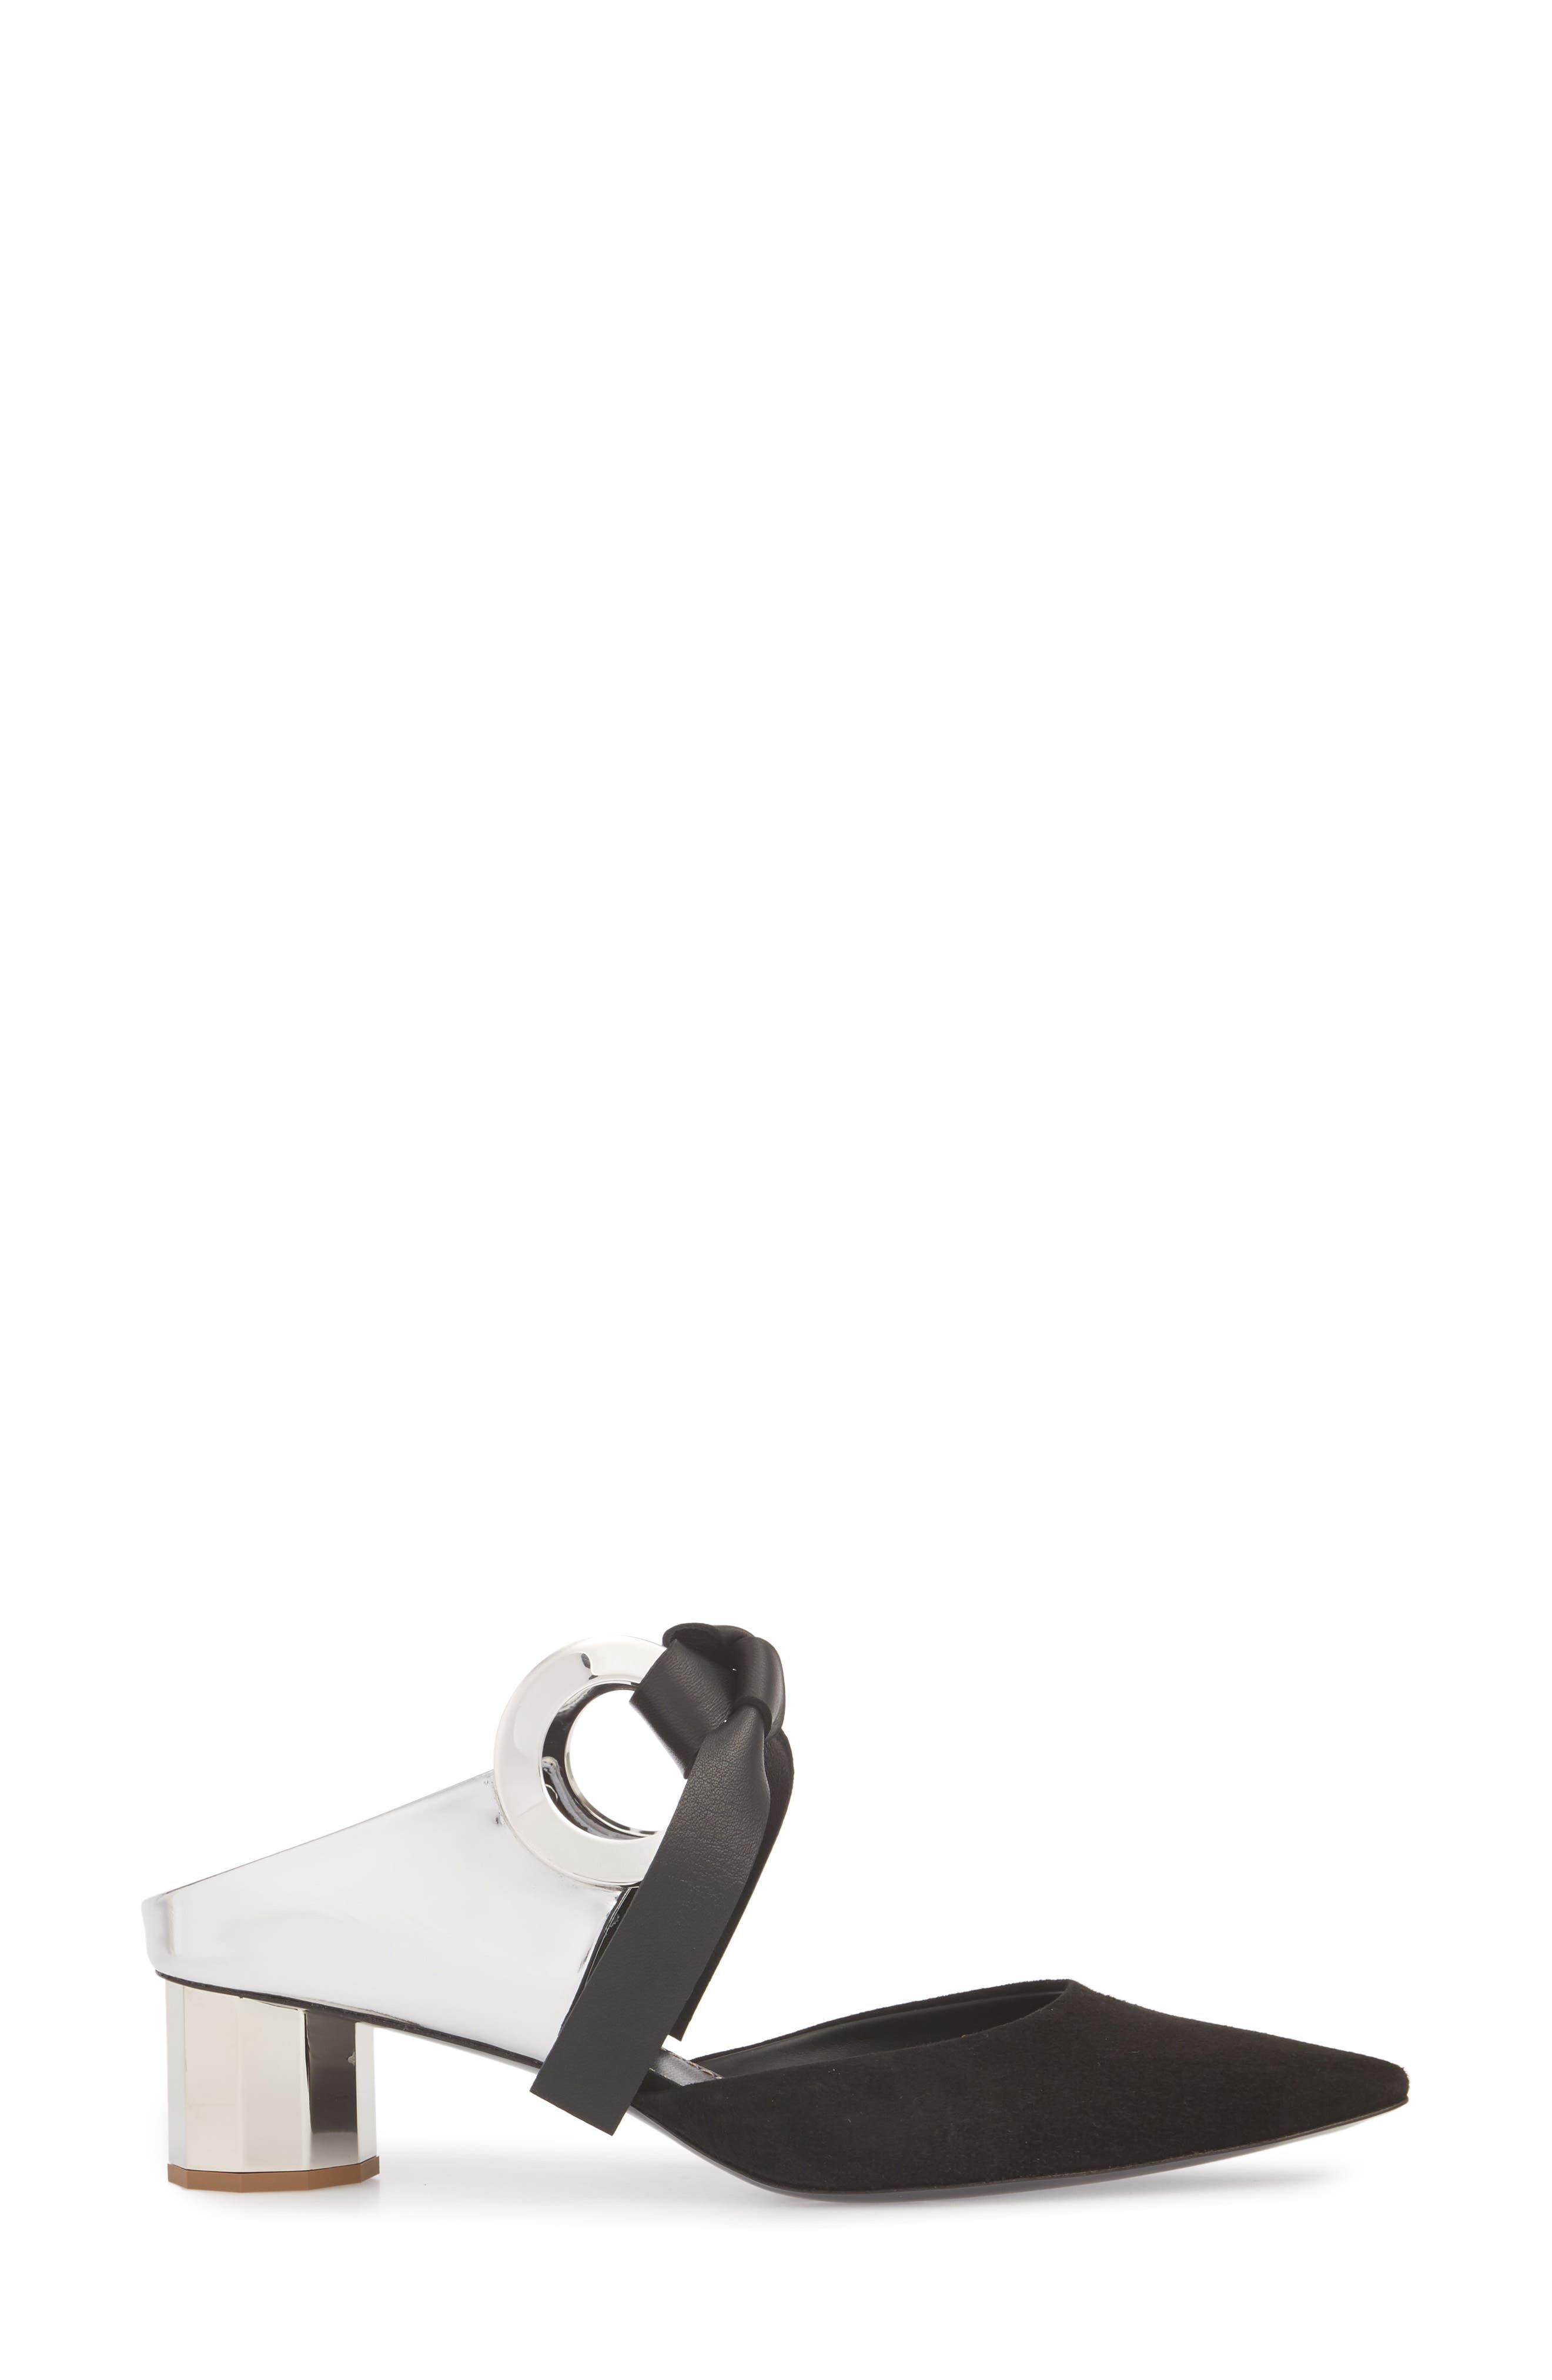 PROENZA SCHOULER, Grommet Pointy Toe Mule, Alternate thumbnail 3, color, SILVER/ BLACK